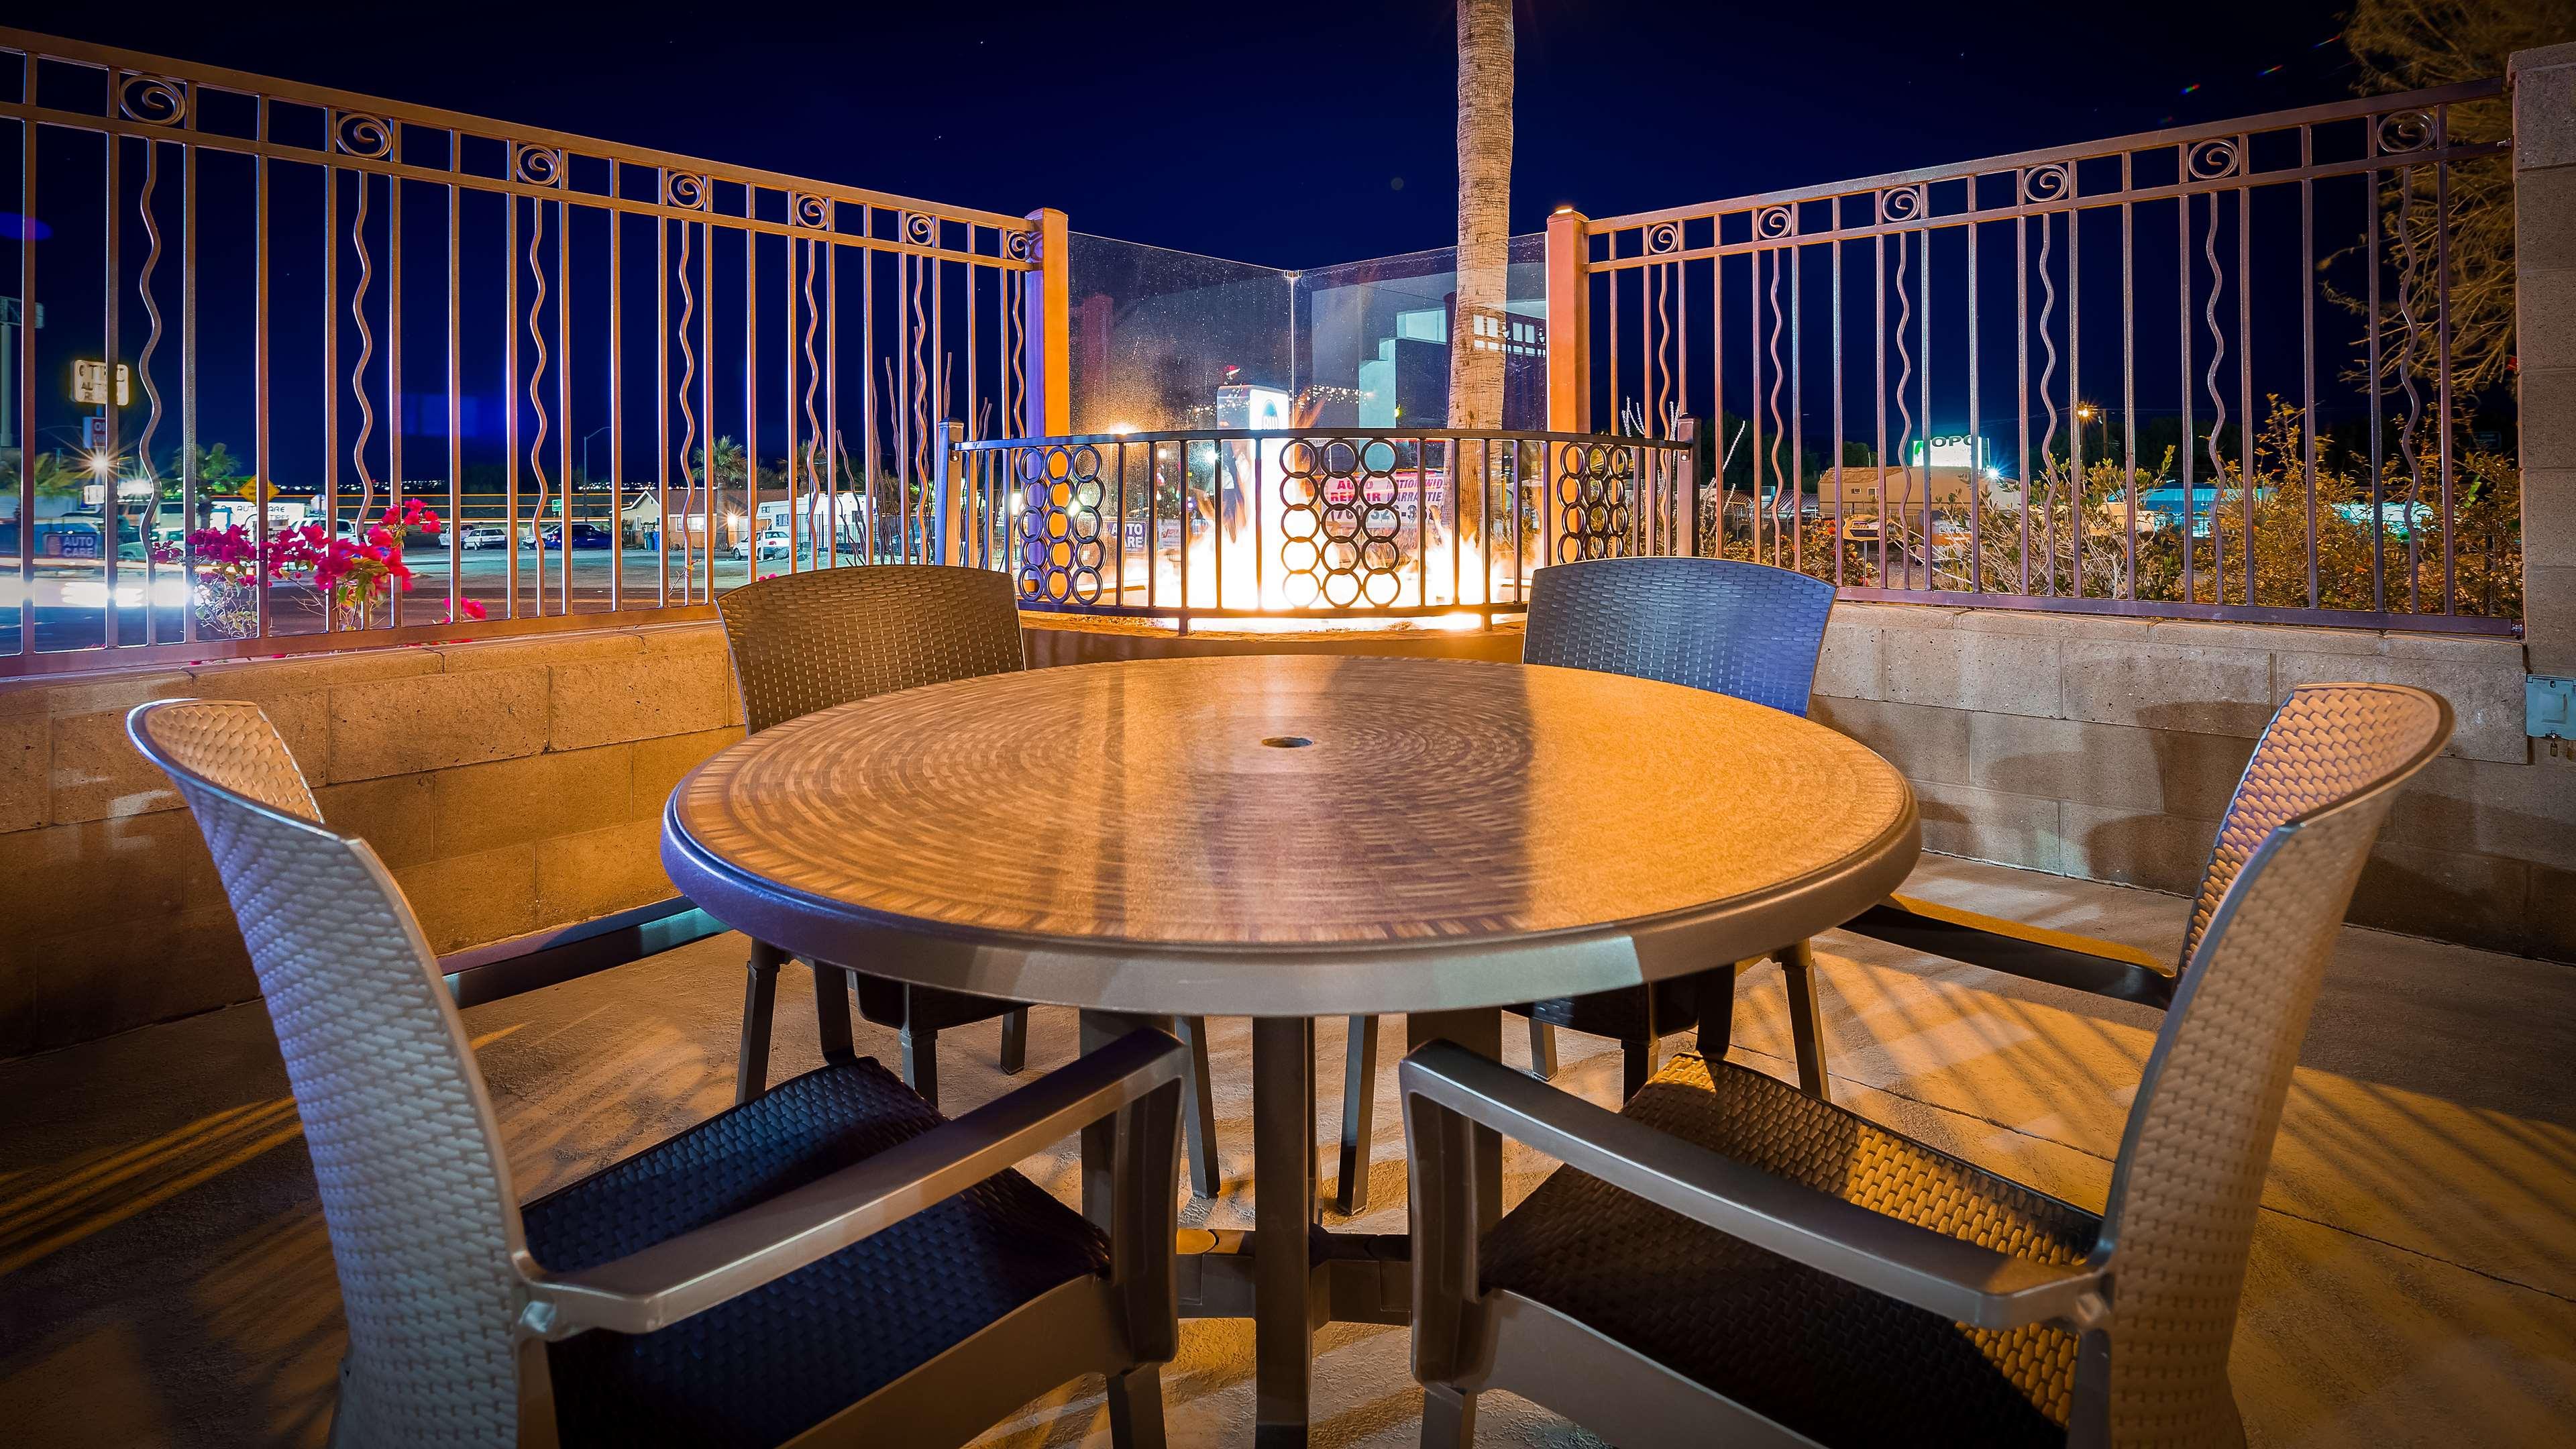 Best Western Colorado River Inn image 5